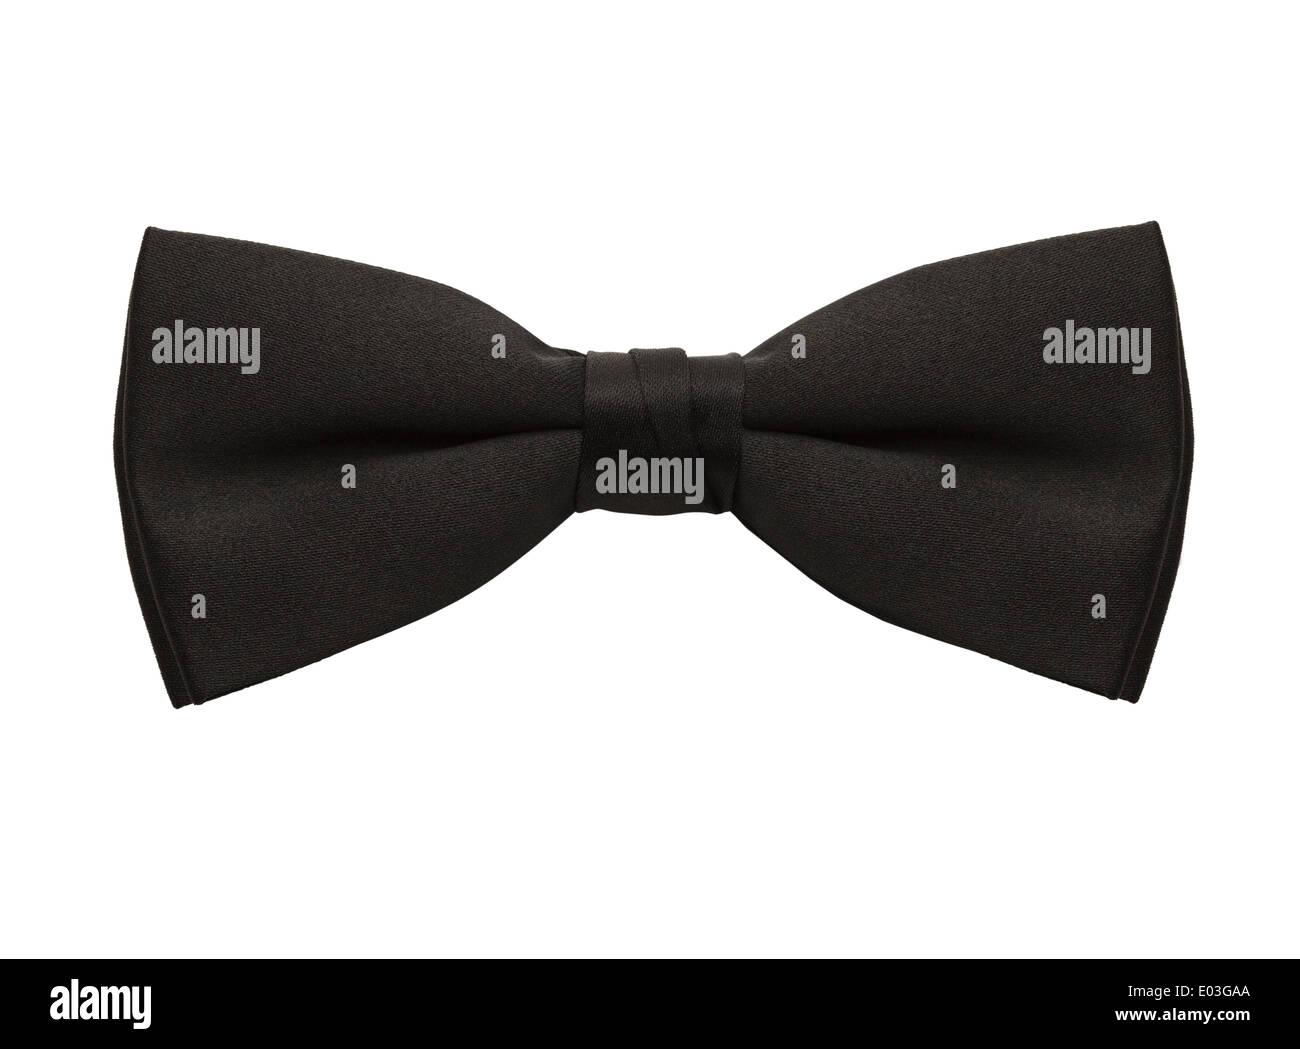 black tie stockfotos black tie bilder alamy. Black Bedroom Furniture Sets. Home Design Ideas